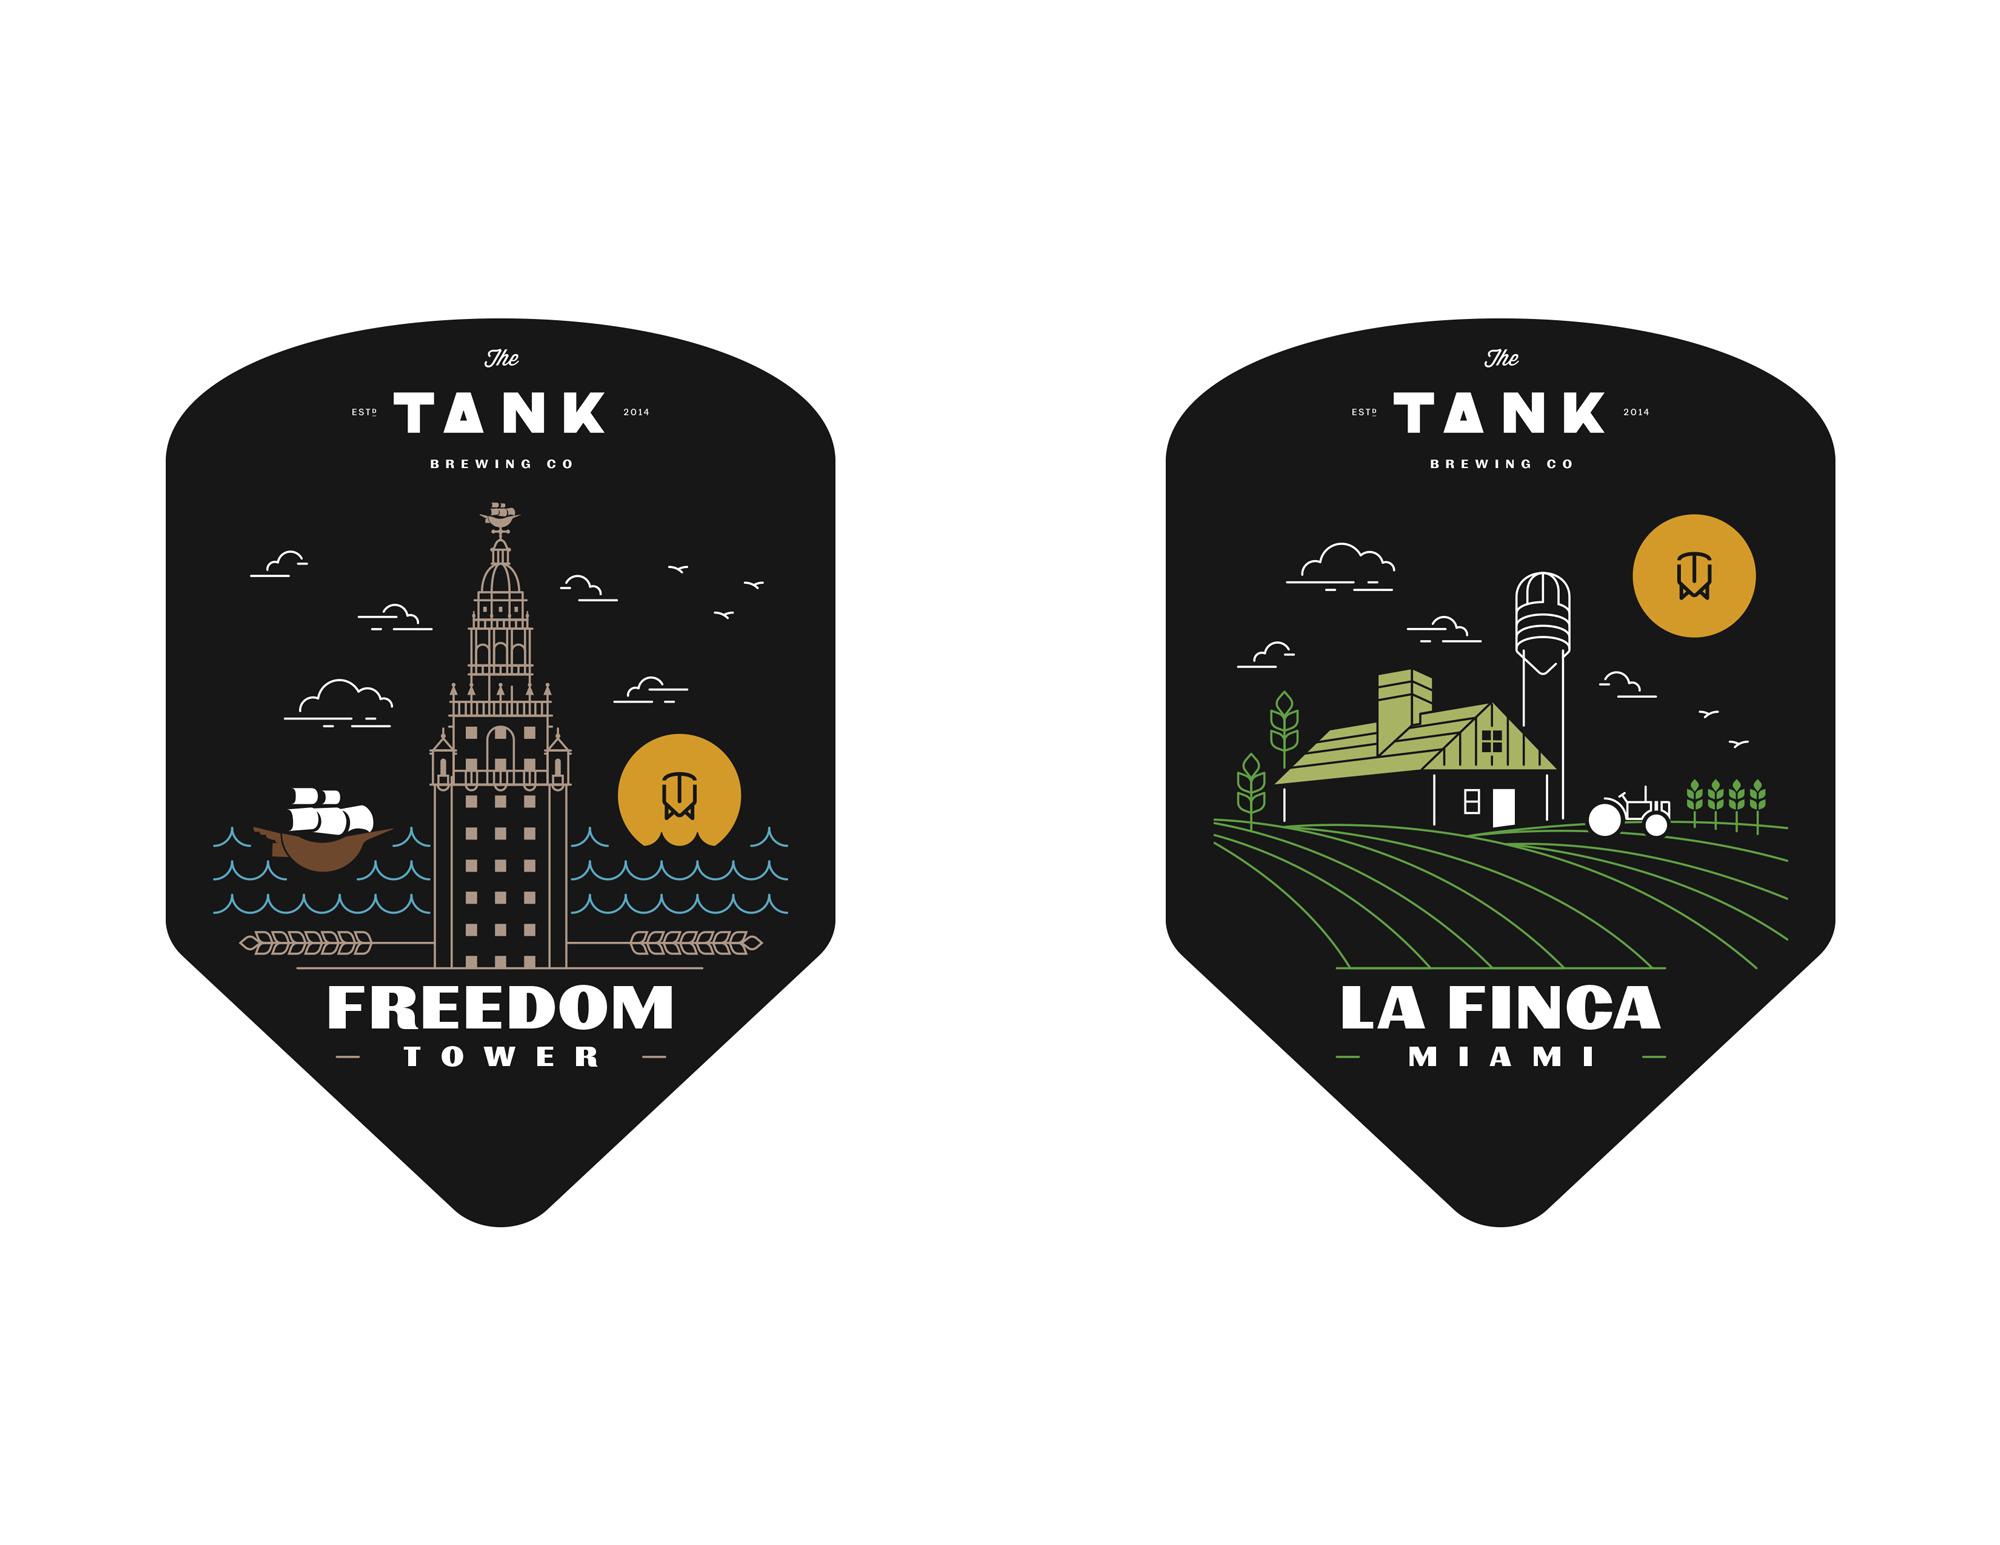 Tank labels 1